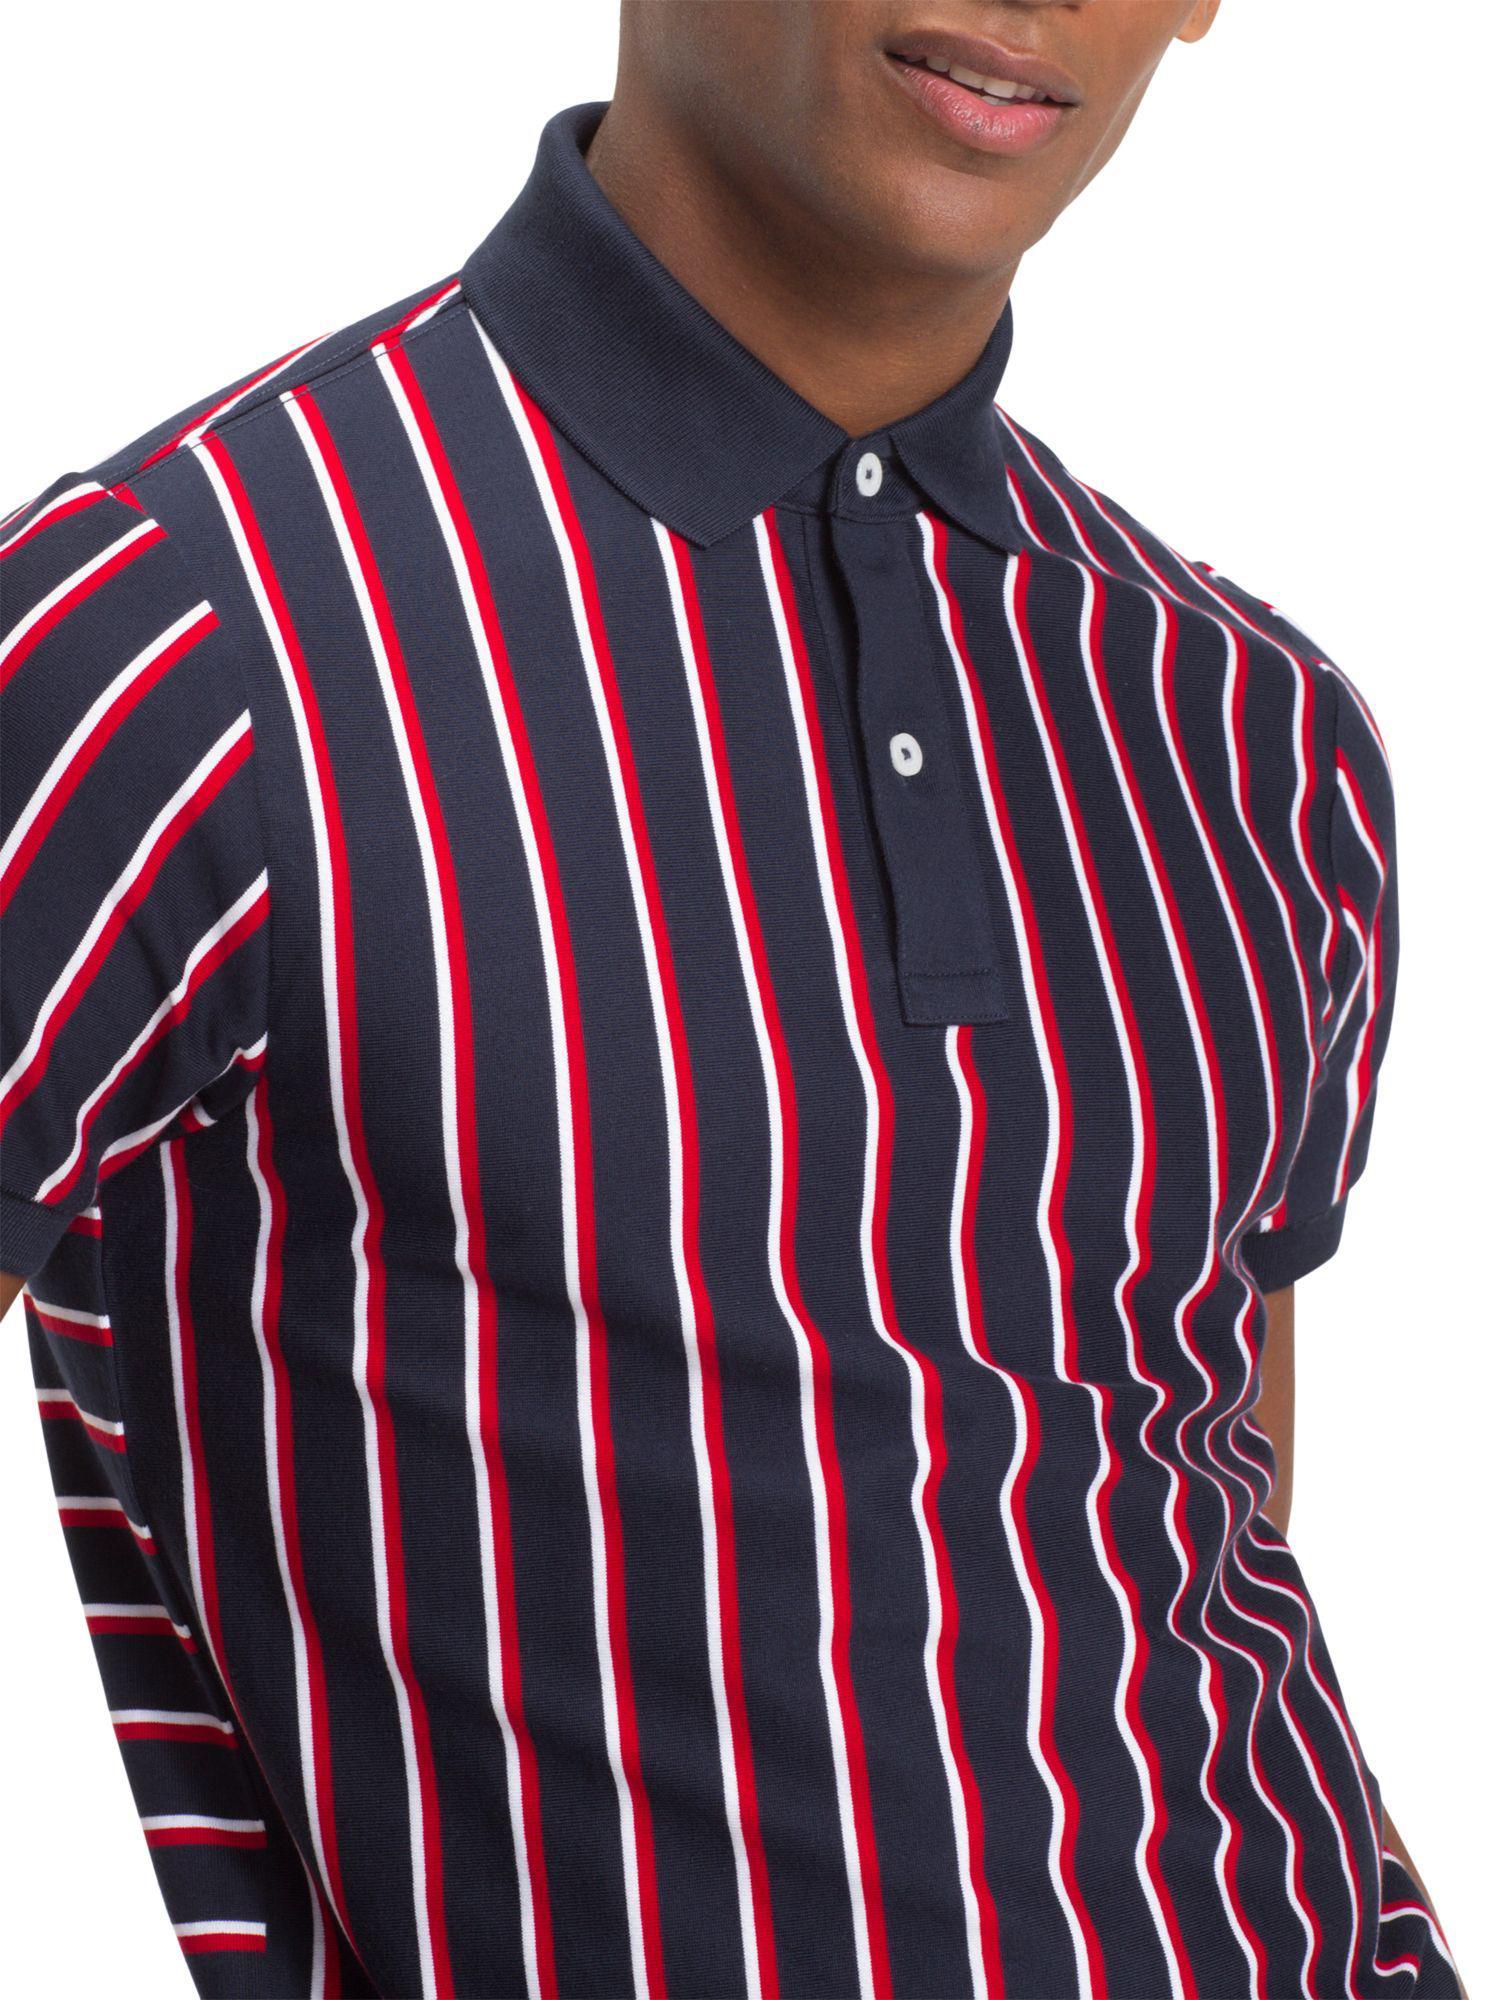 6f897815 Tommy Hilfiger Vertical Stripe Slim Polo in Blue for Men - Lyst